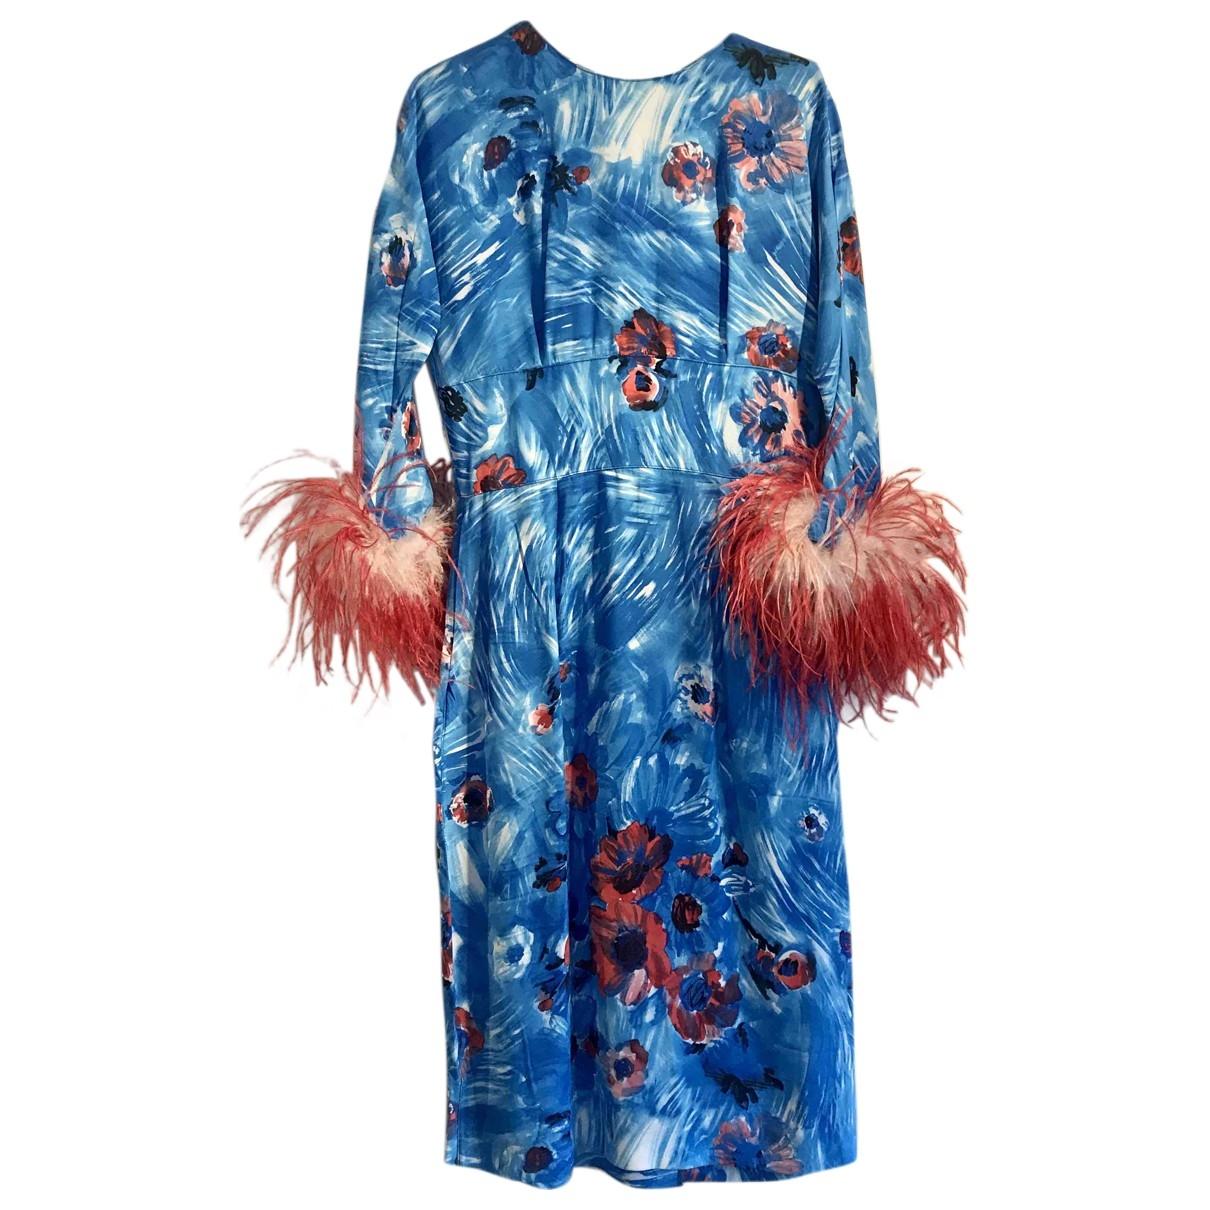 Prada \N Blue dress for Women 38 IT